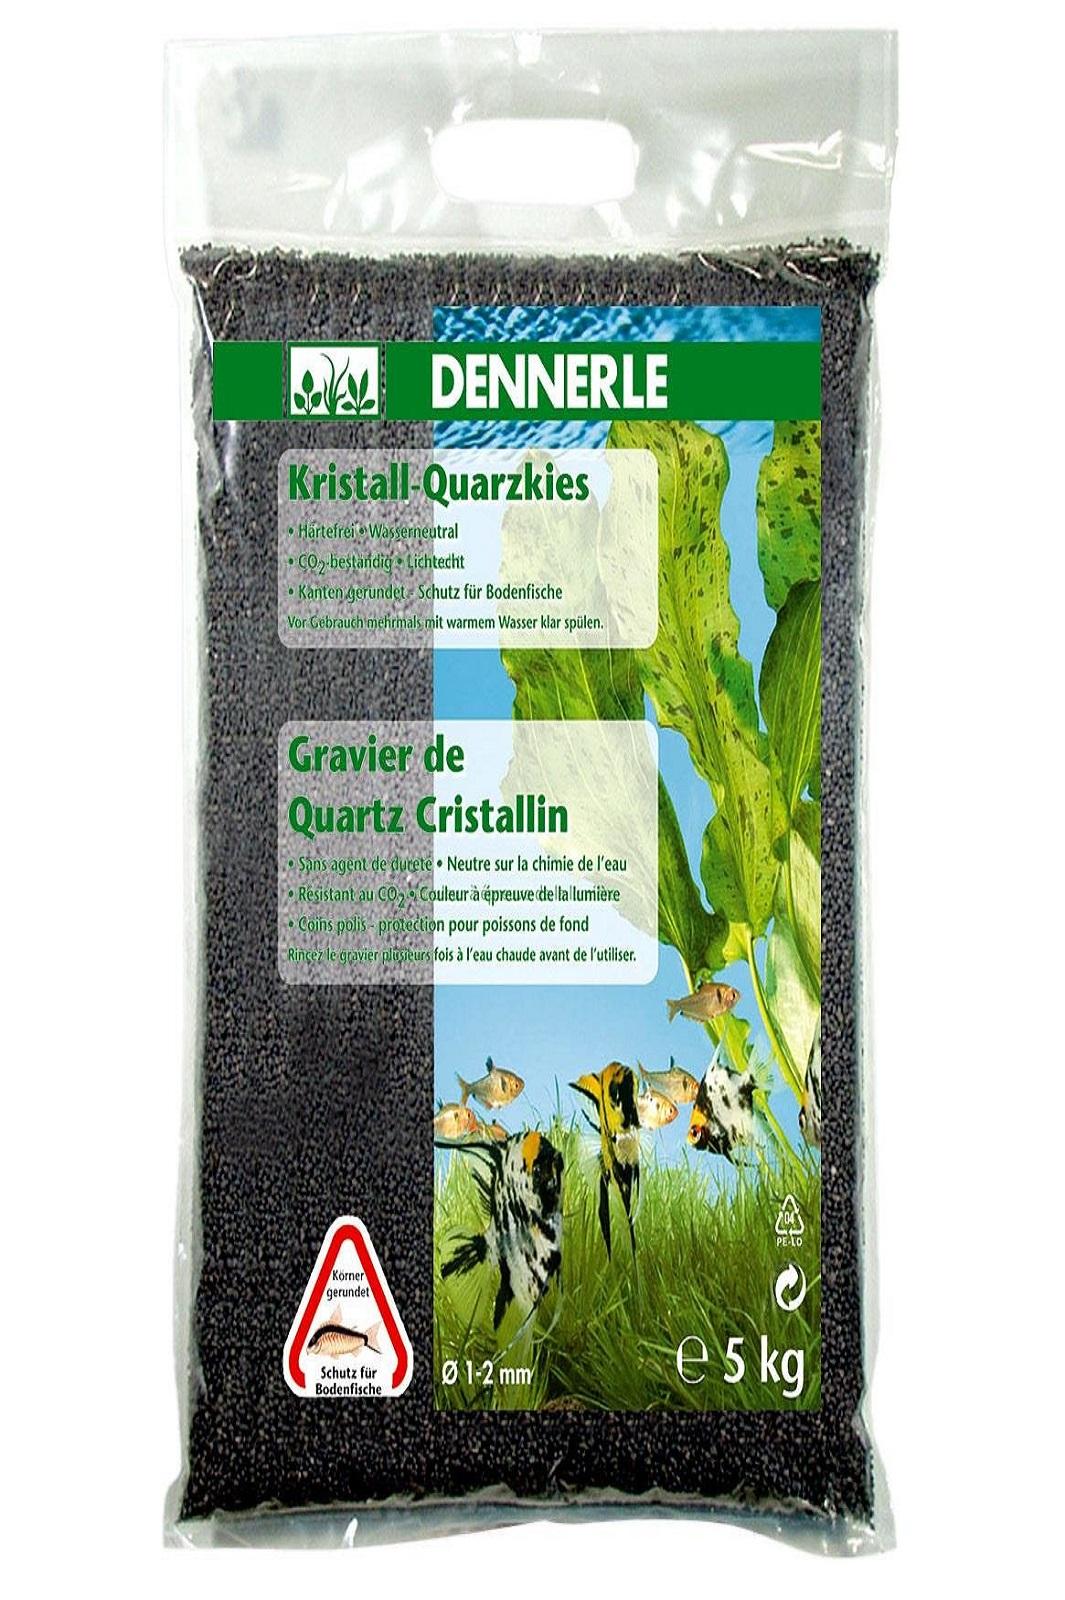 Dennerle Kristall-Quarzkies schiefergrau 5 Kg